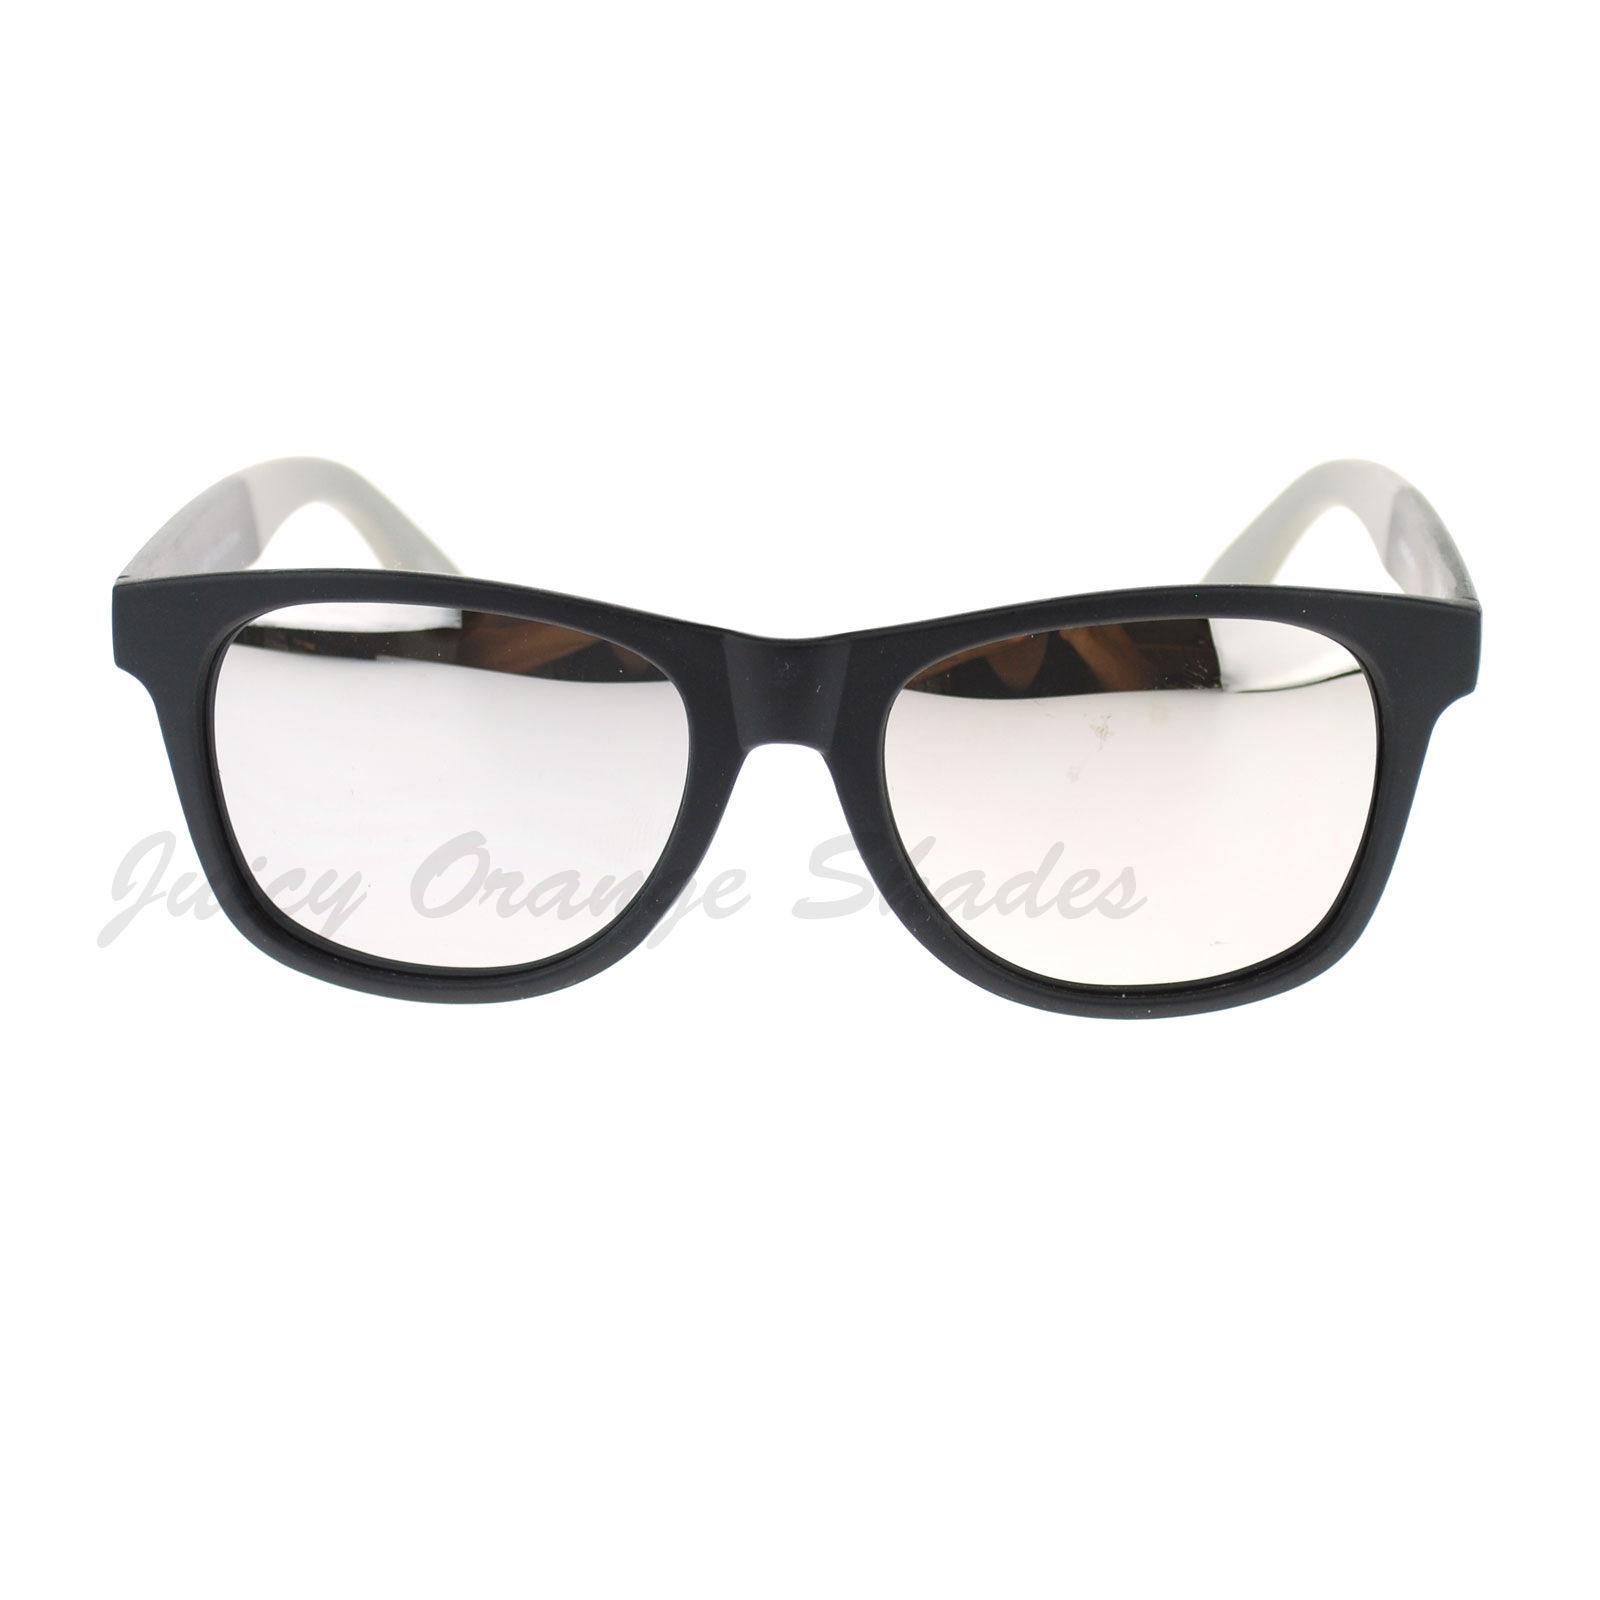 KUSH Square Unisex Sunglasses 2-tone Matte Frame Multicolor Lens